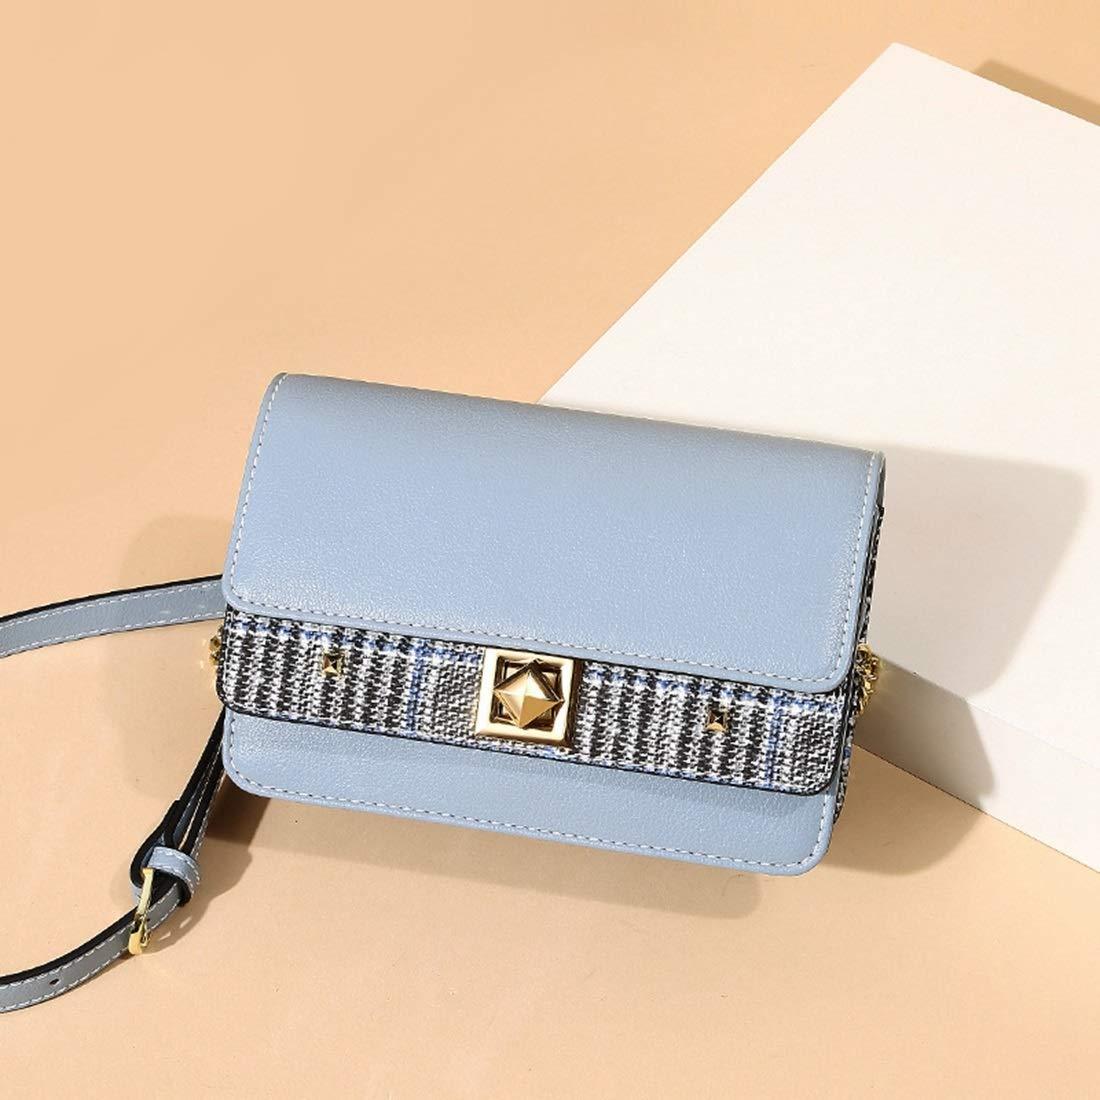 Color : Pink Carriemeow Spring and Summer Contrast Color Small Square Bag Shoulder Messenger Bag Female Bag Small Bag